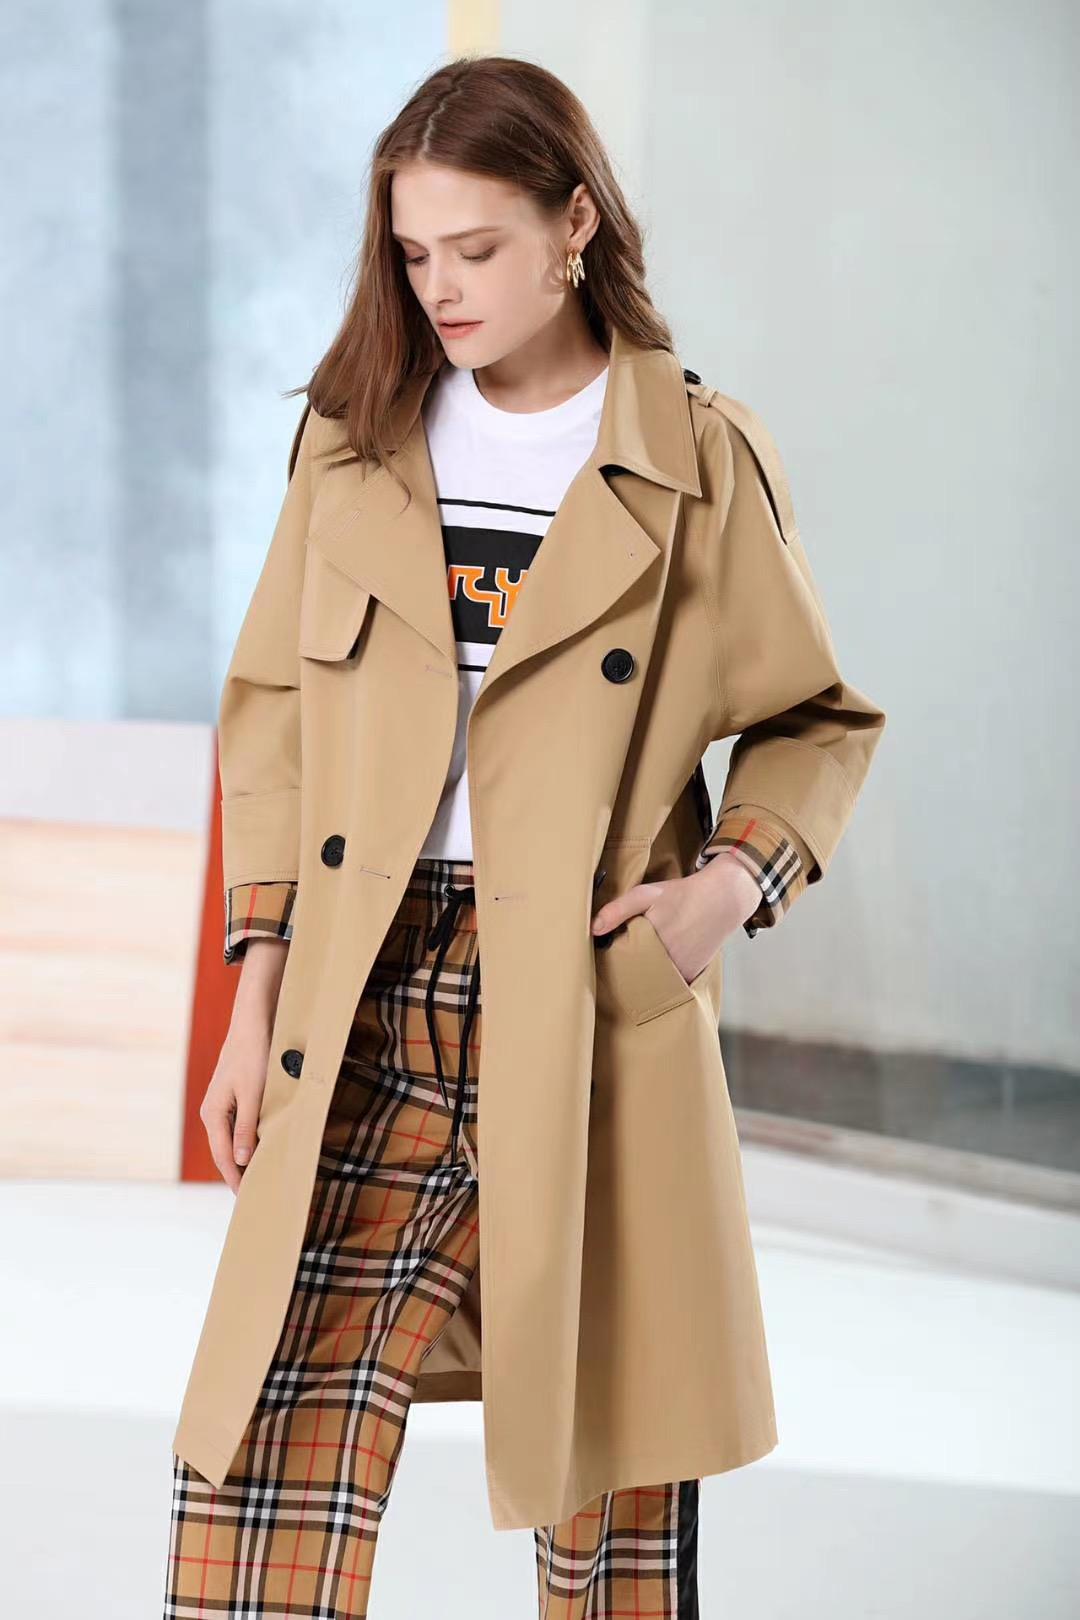 Cheap          Trench Coats Women Jackets Burerry Women's Trench Coats Price  9